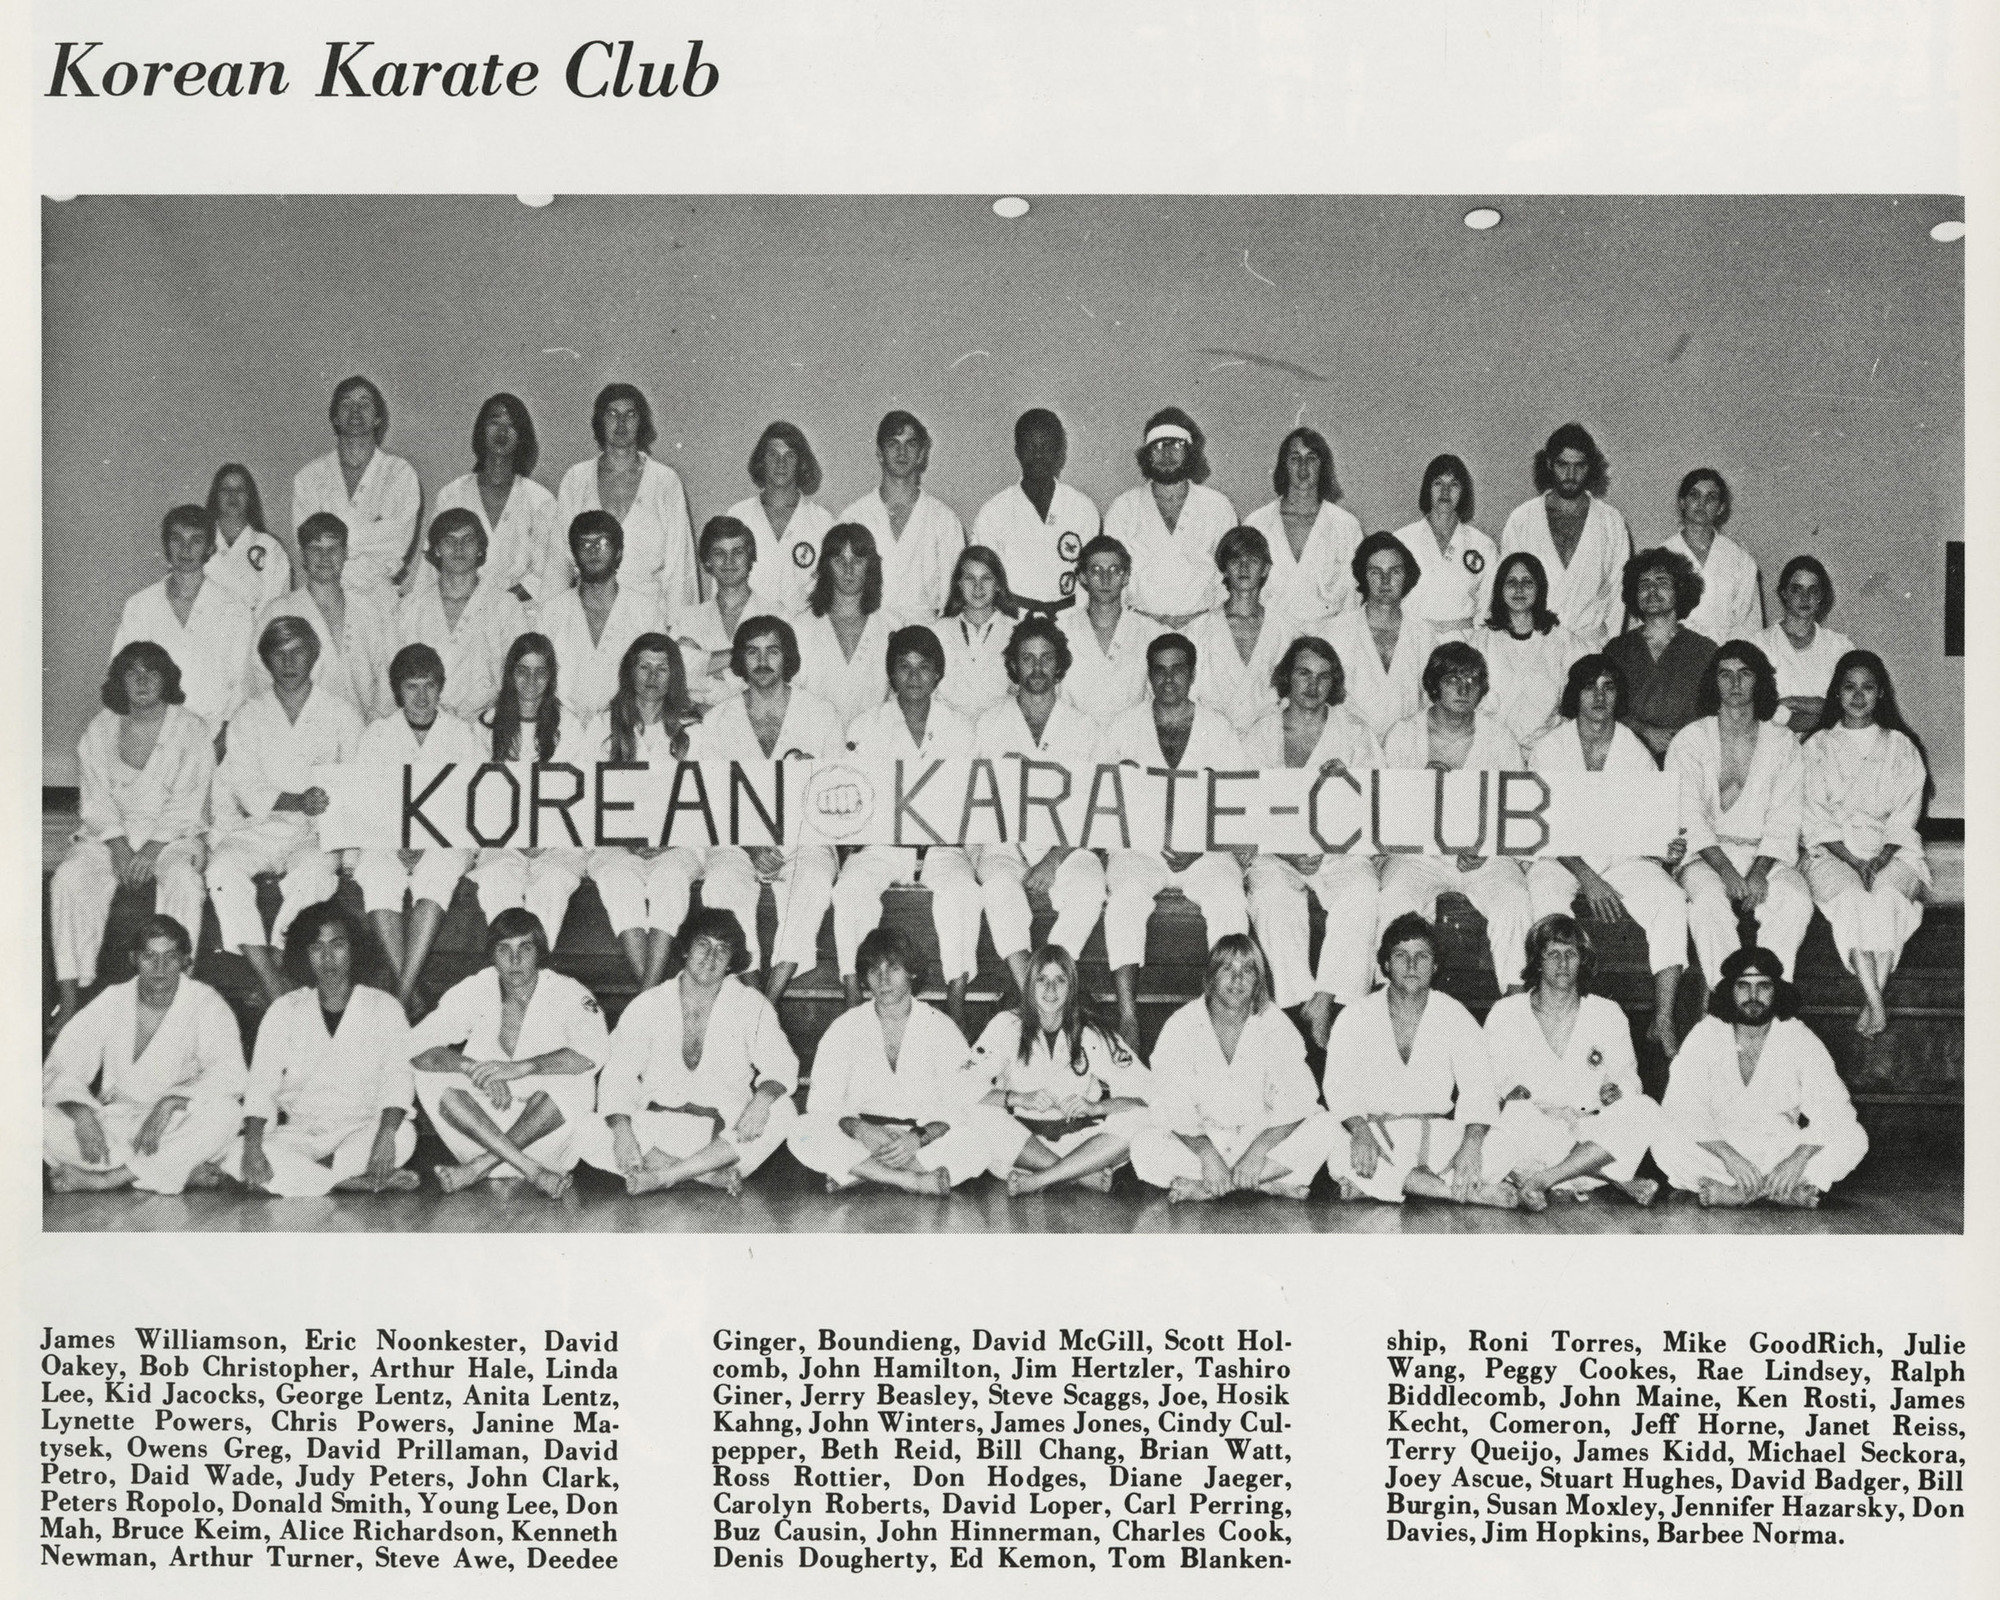 http://spec.lib.vt.edu/pickup/Omeka_upload/Bugle1974_pg198_Karate.jpg